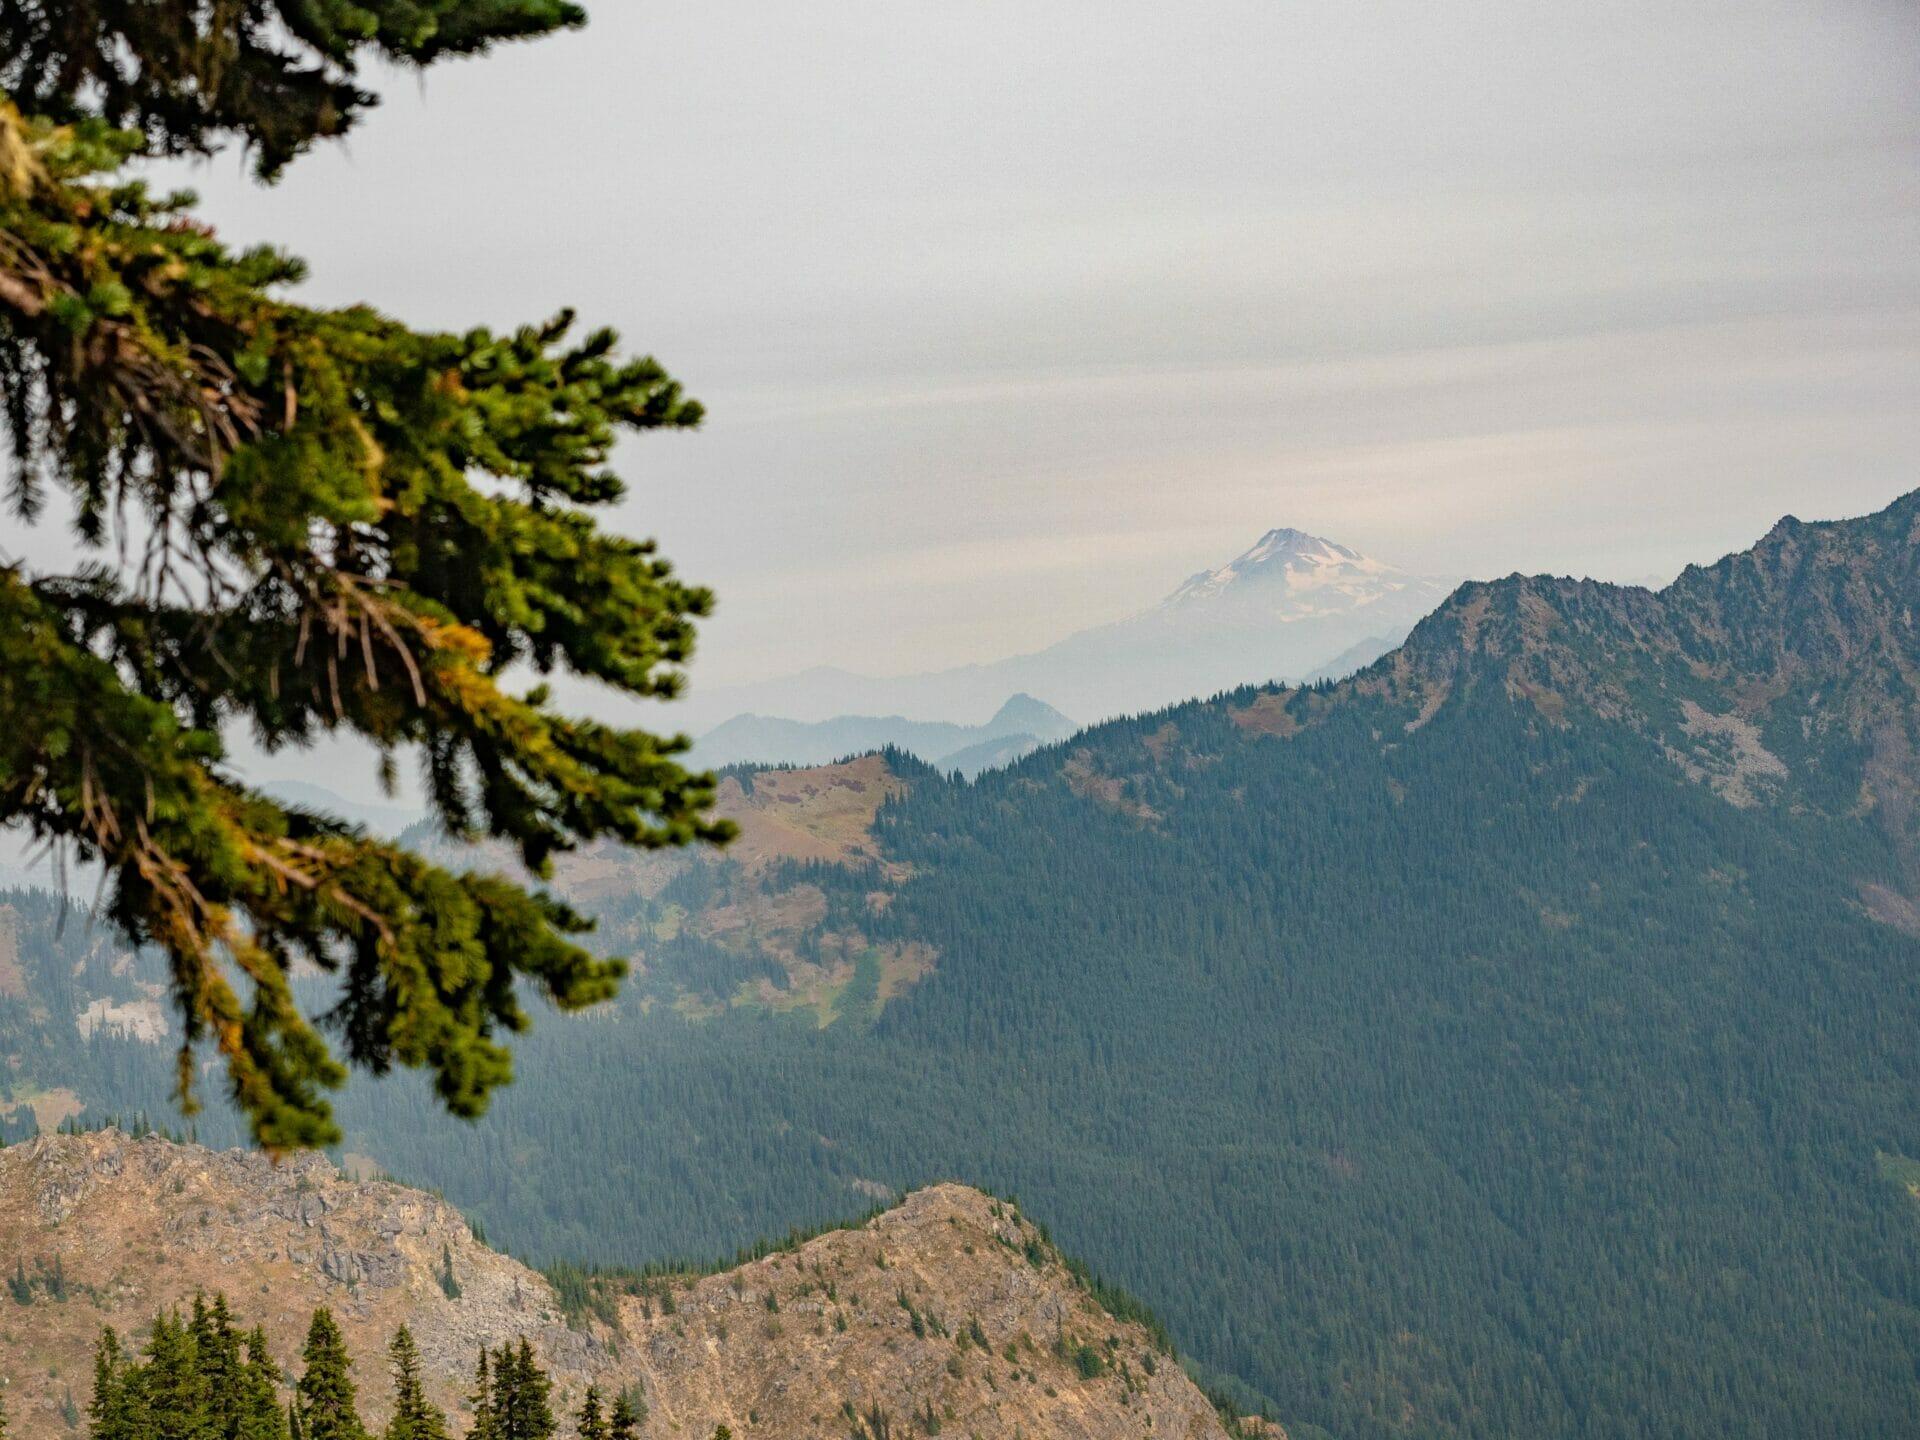 Glacier Peak Alpine Lakes Wilderness